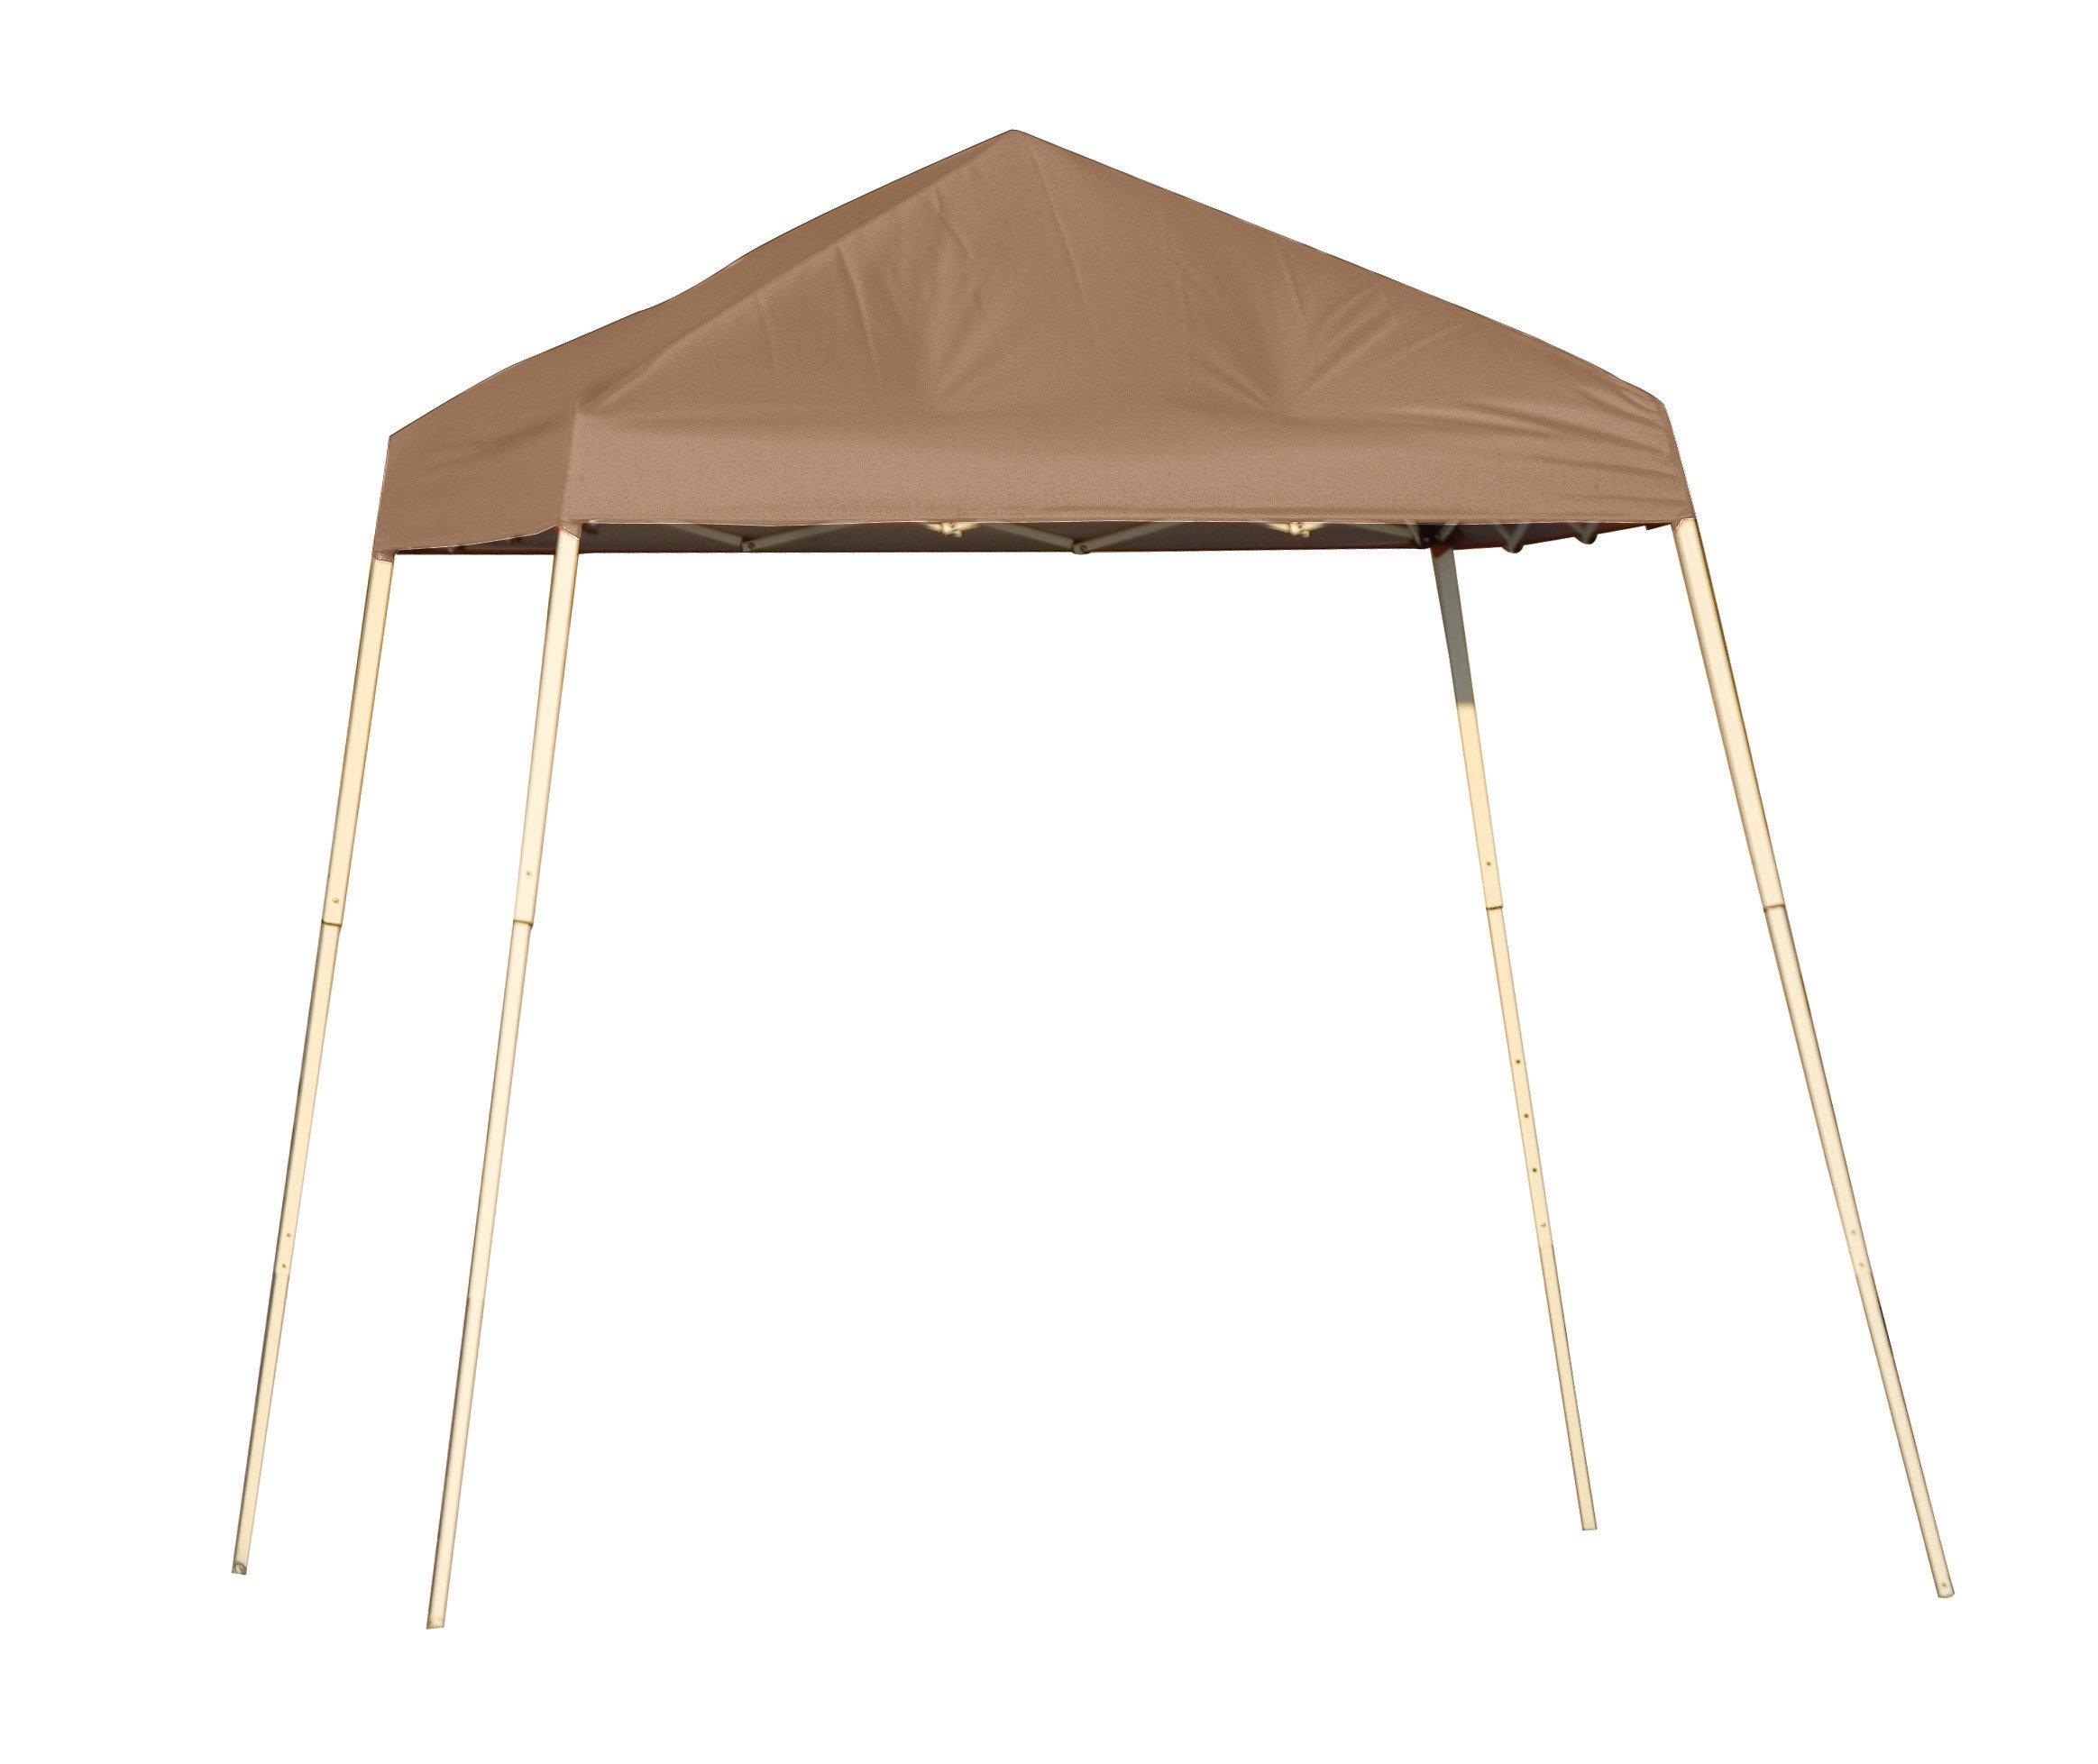 ShelterLogic Slant Leg Pop-Up Canopy with Carry Bag, Desert Bronze, 8 x 8 ft.